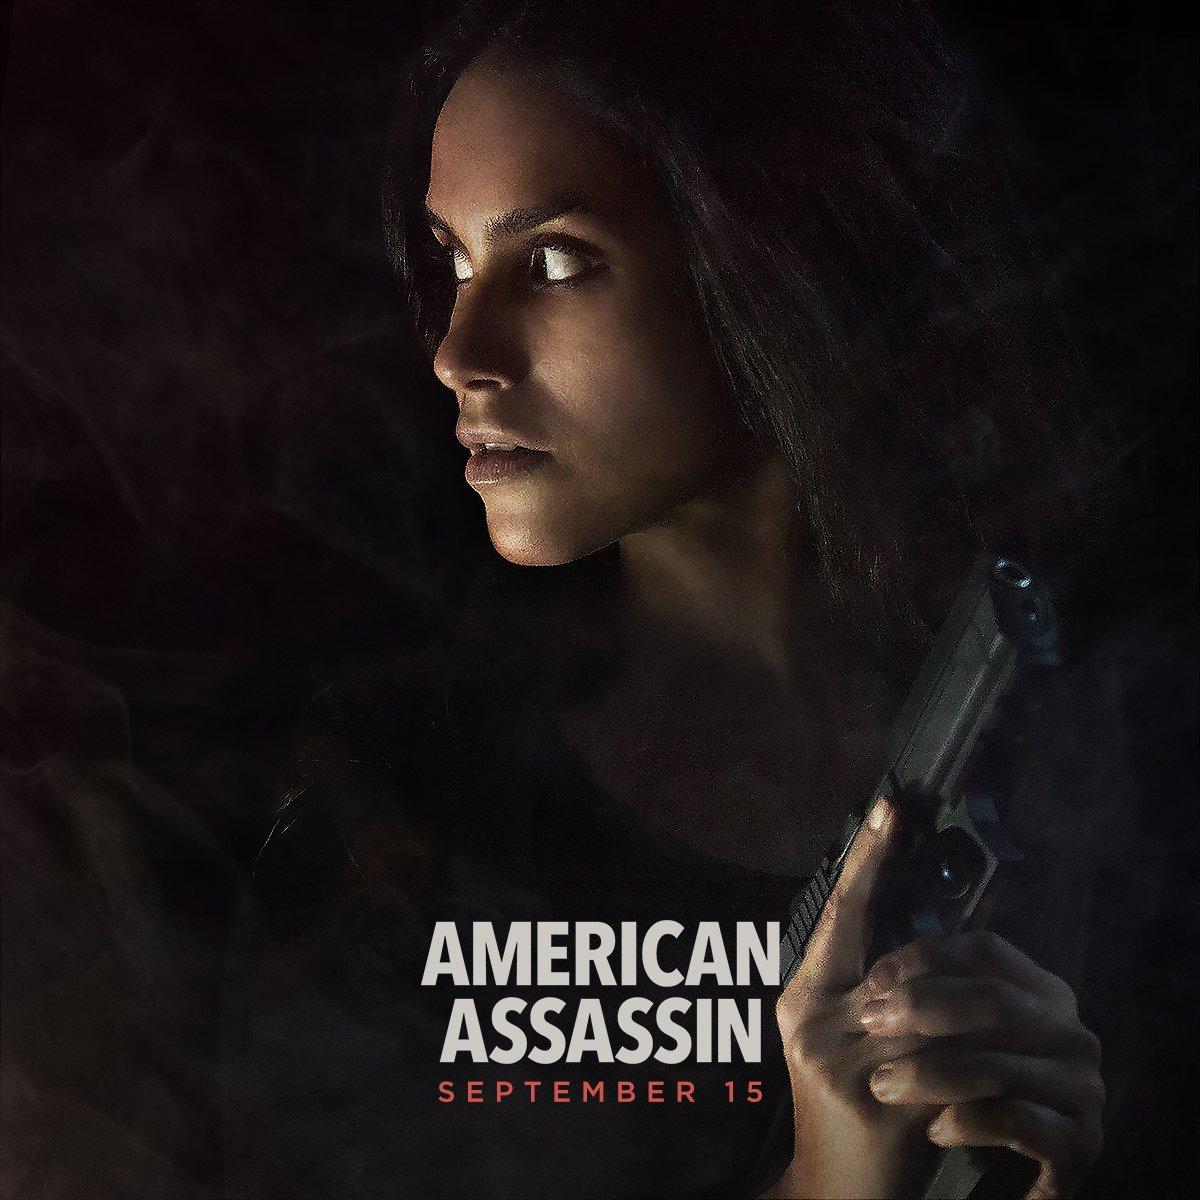 american assassin character poster 3.jpg